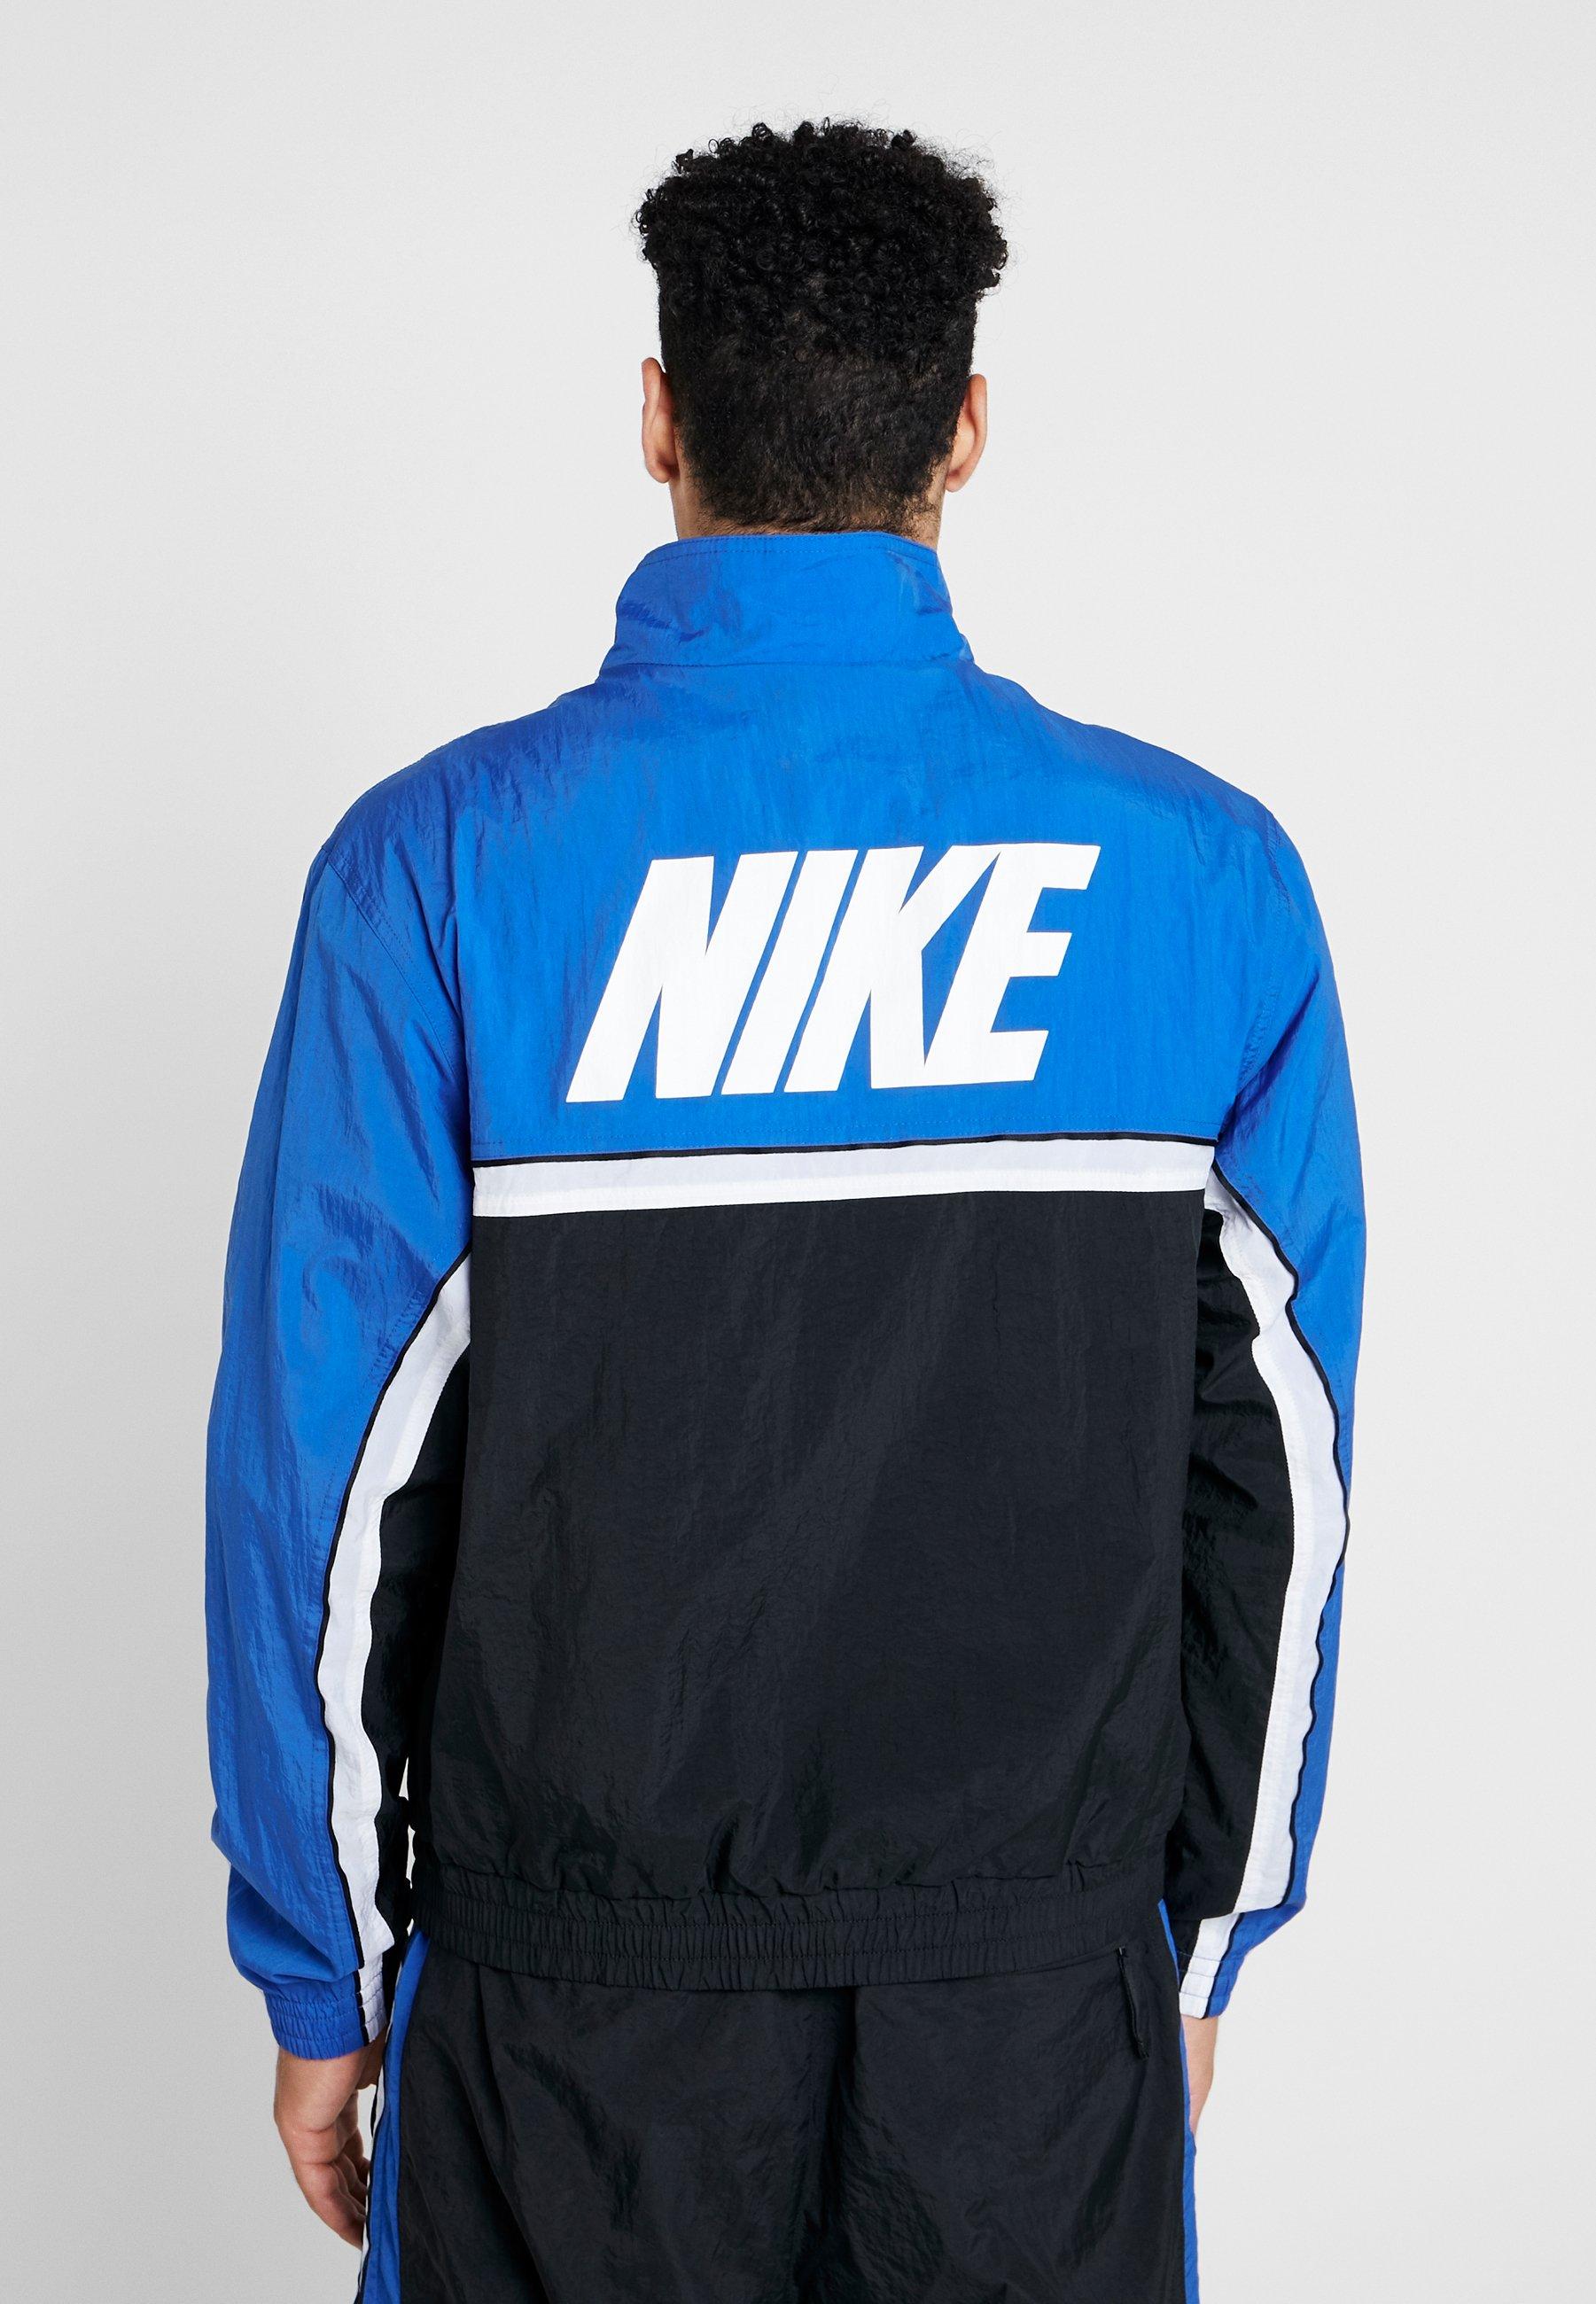 ThrowbackVeste white Survêtement Game Nike black Performance De Royal nwOPk0